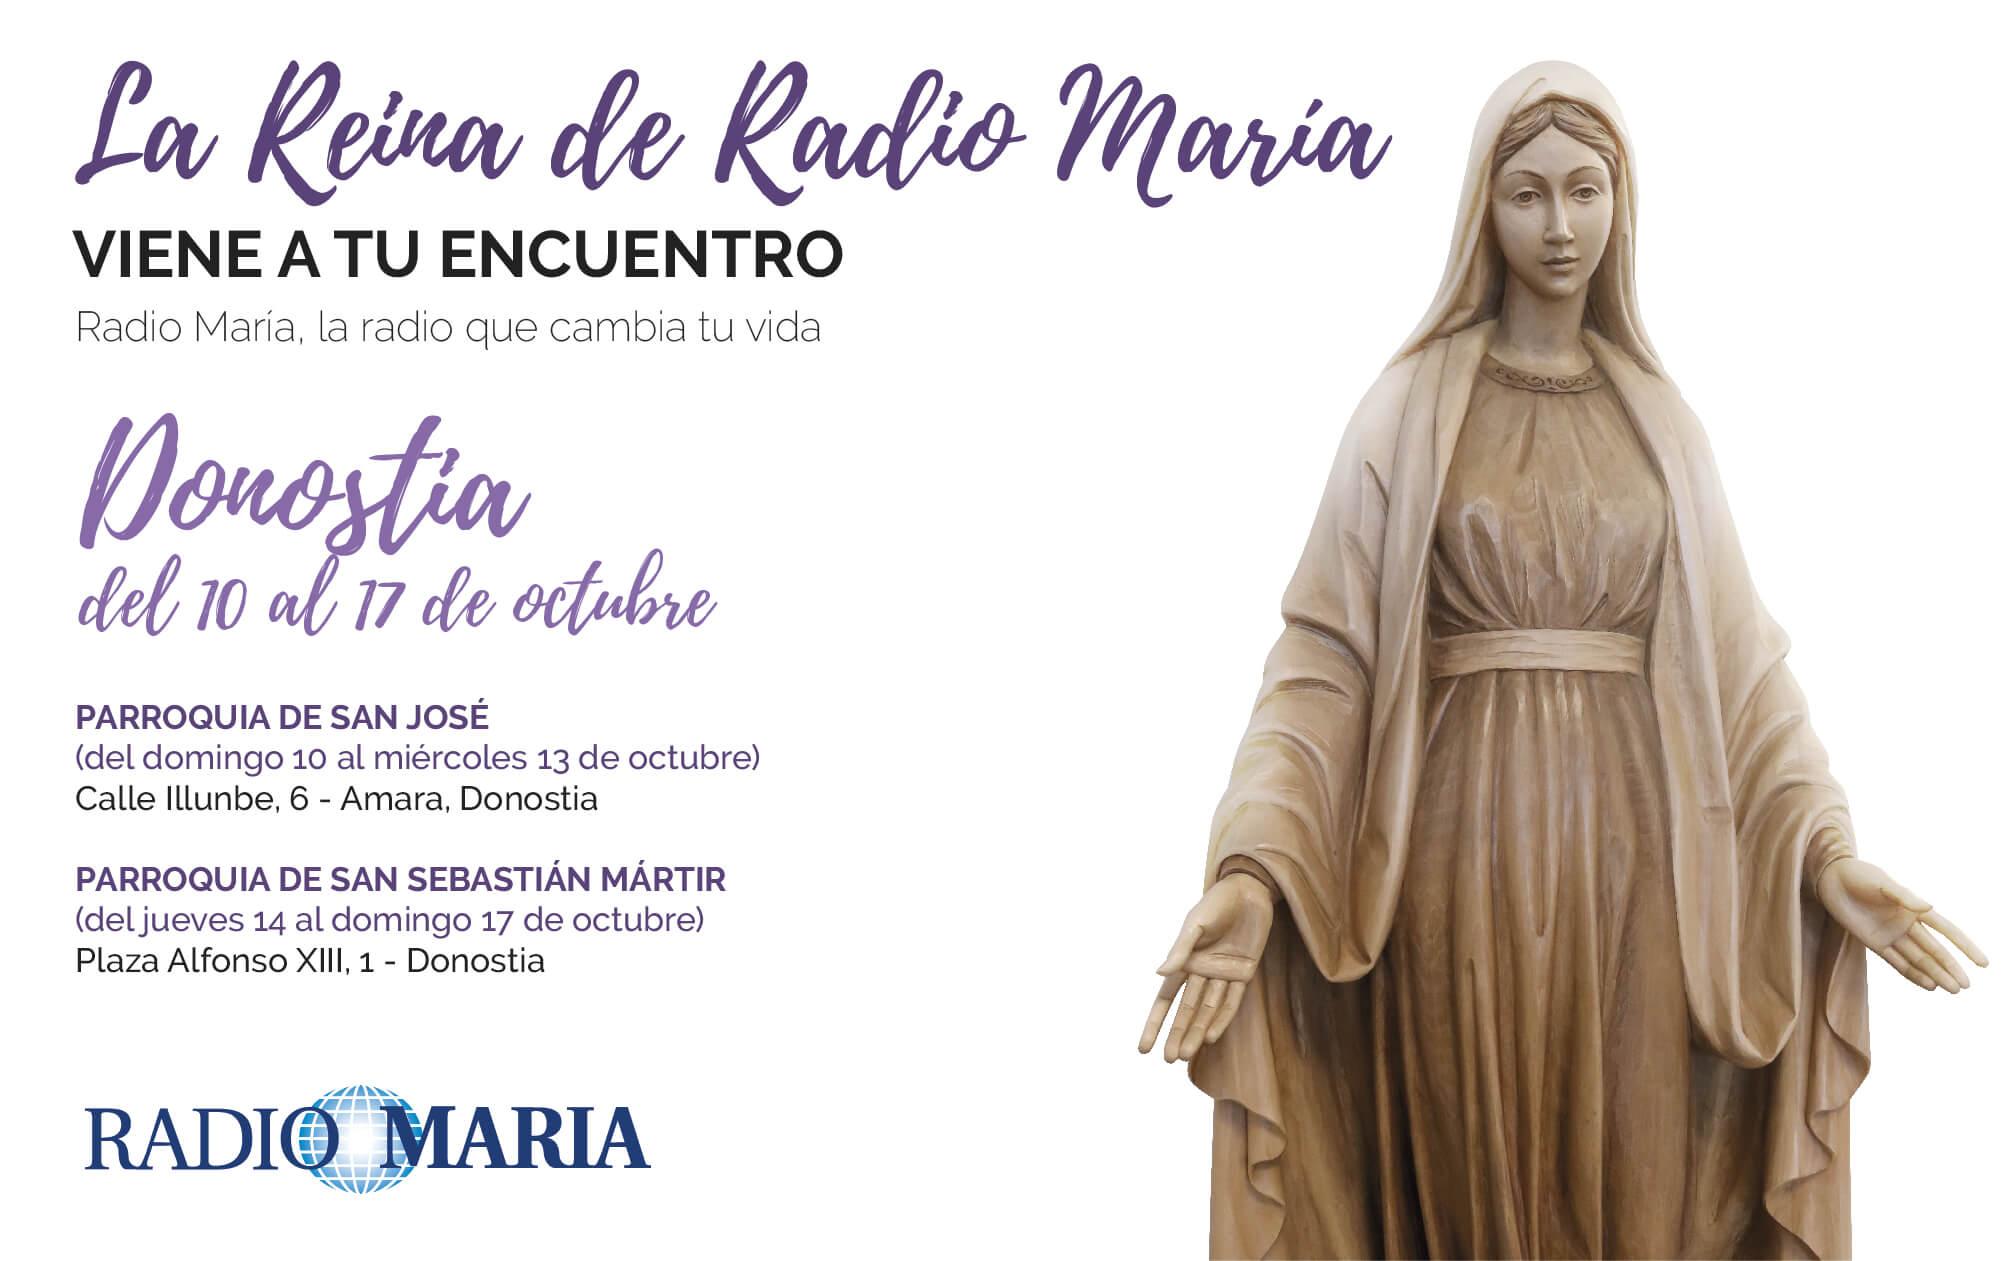 La Reina de Radio María visita San Sebastián